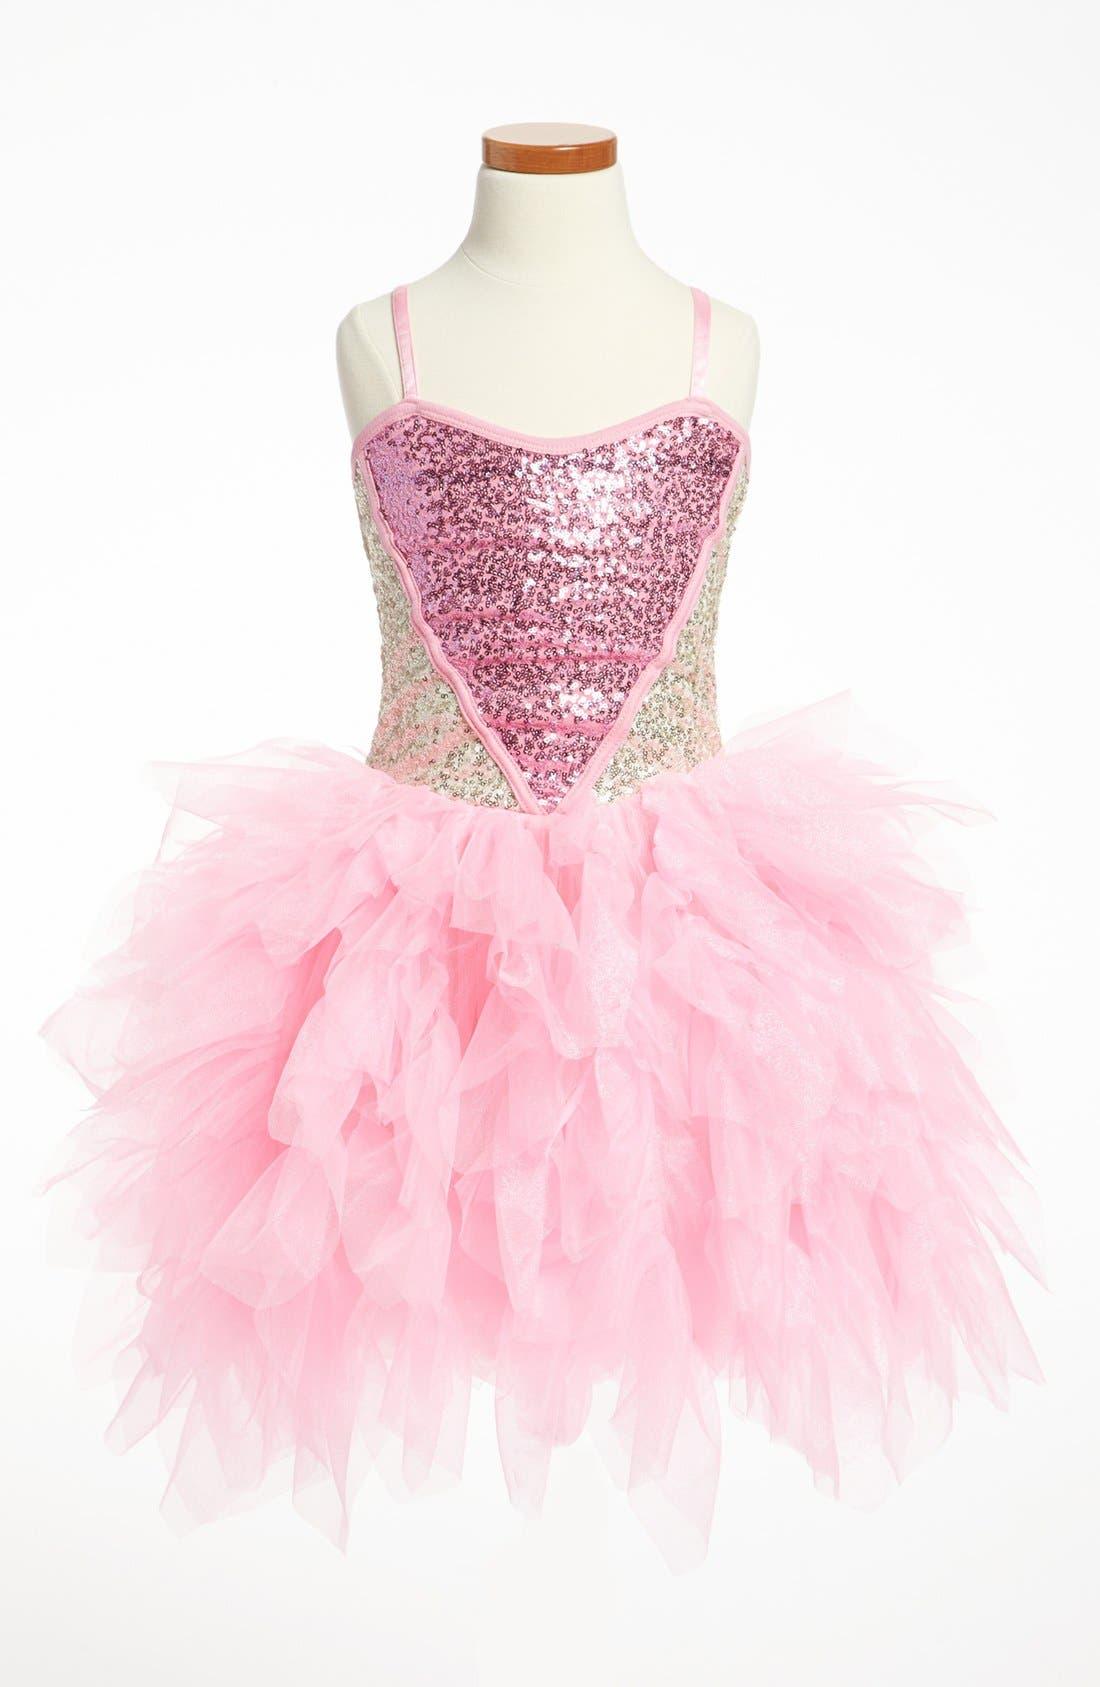 Alternate Image 1 Selected - Ooh! La, La! Couture 'Sweetheart' Dress (Big Girls)